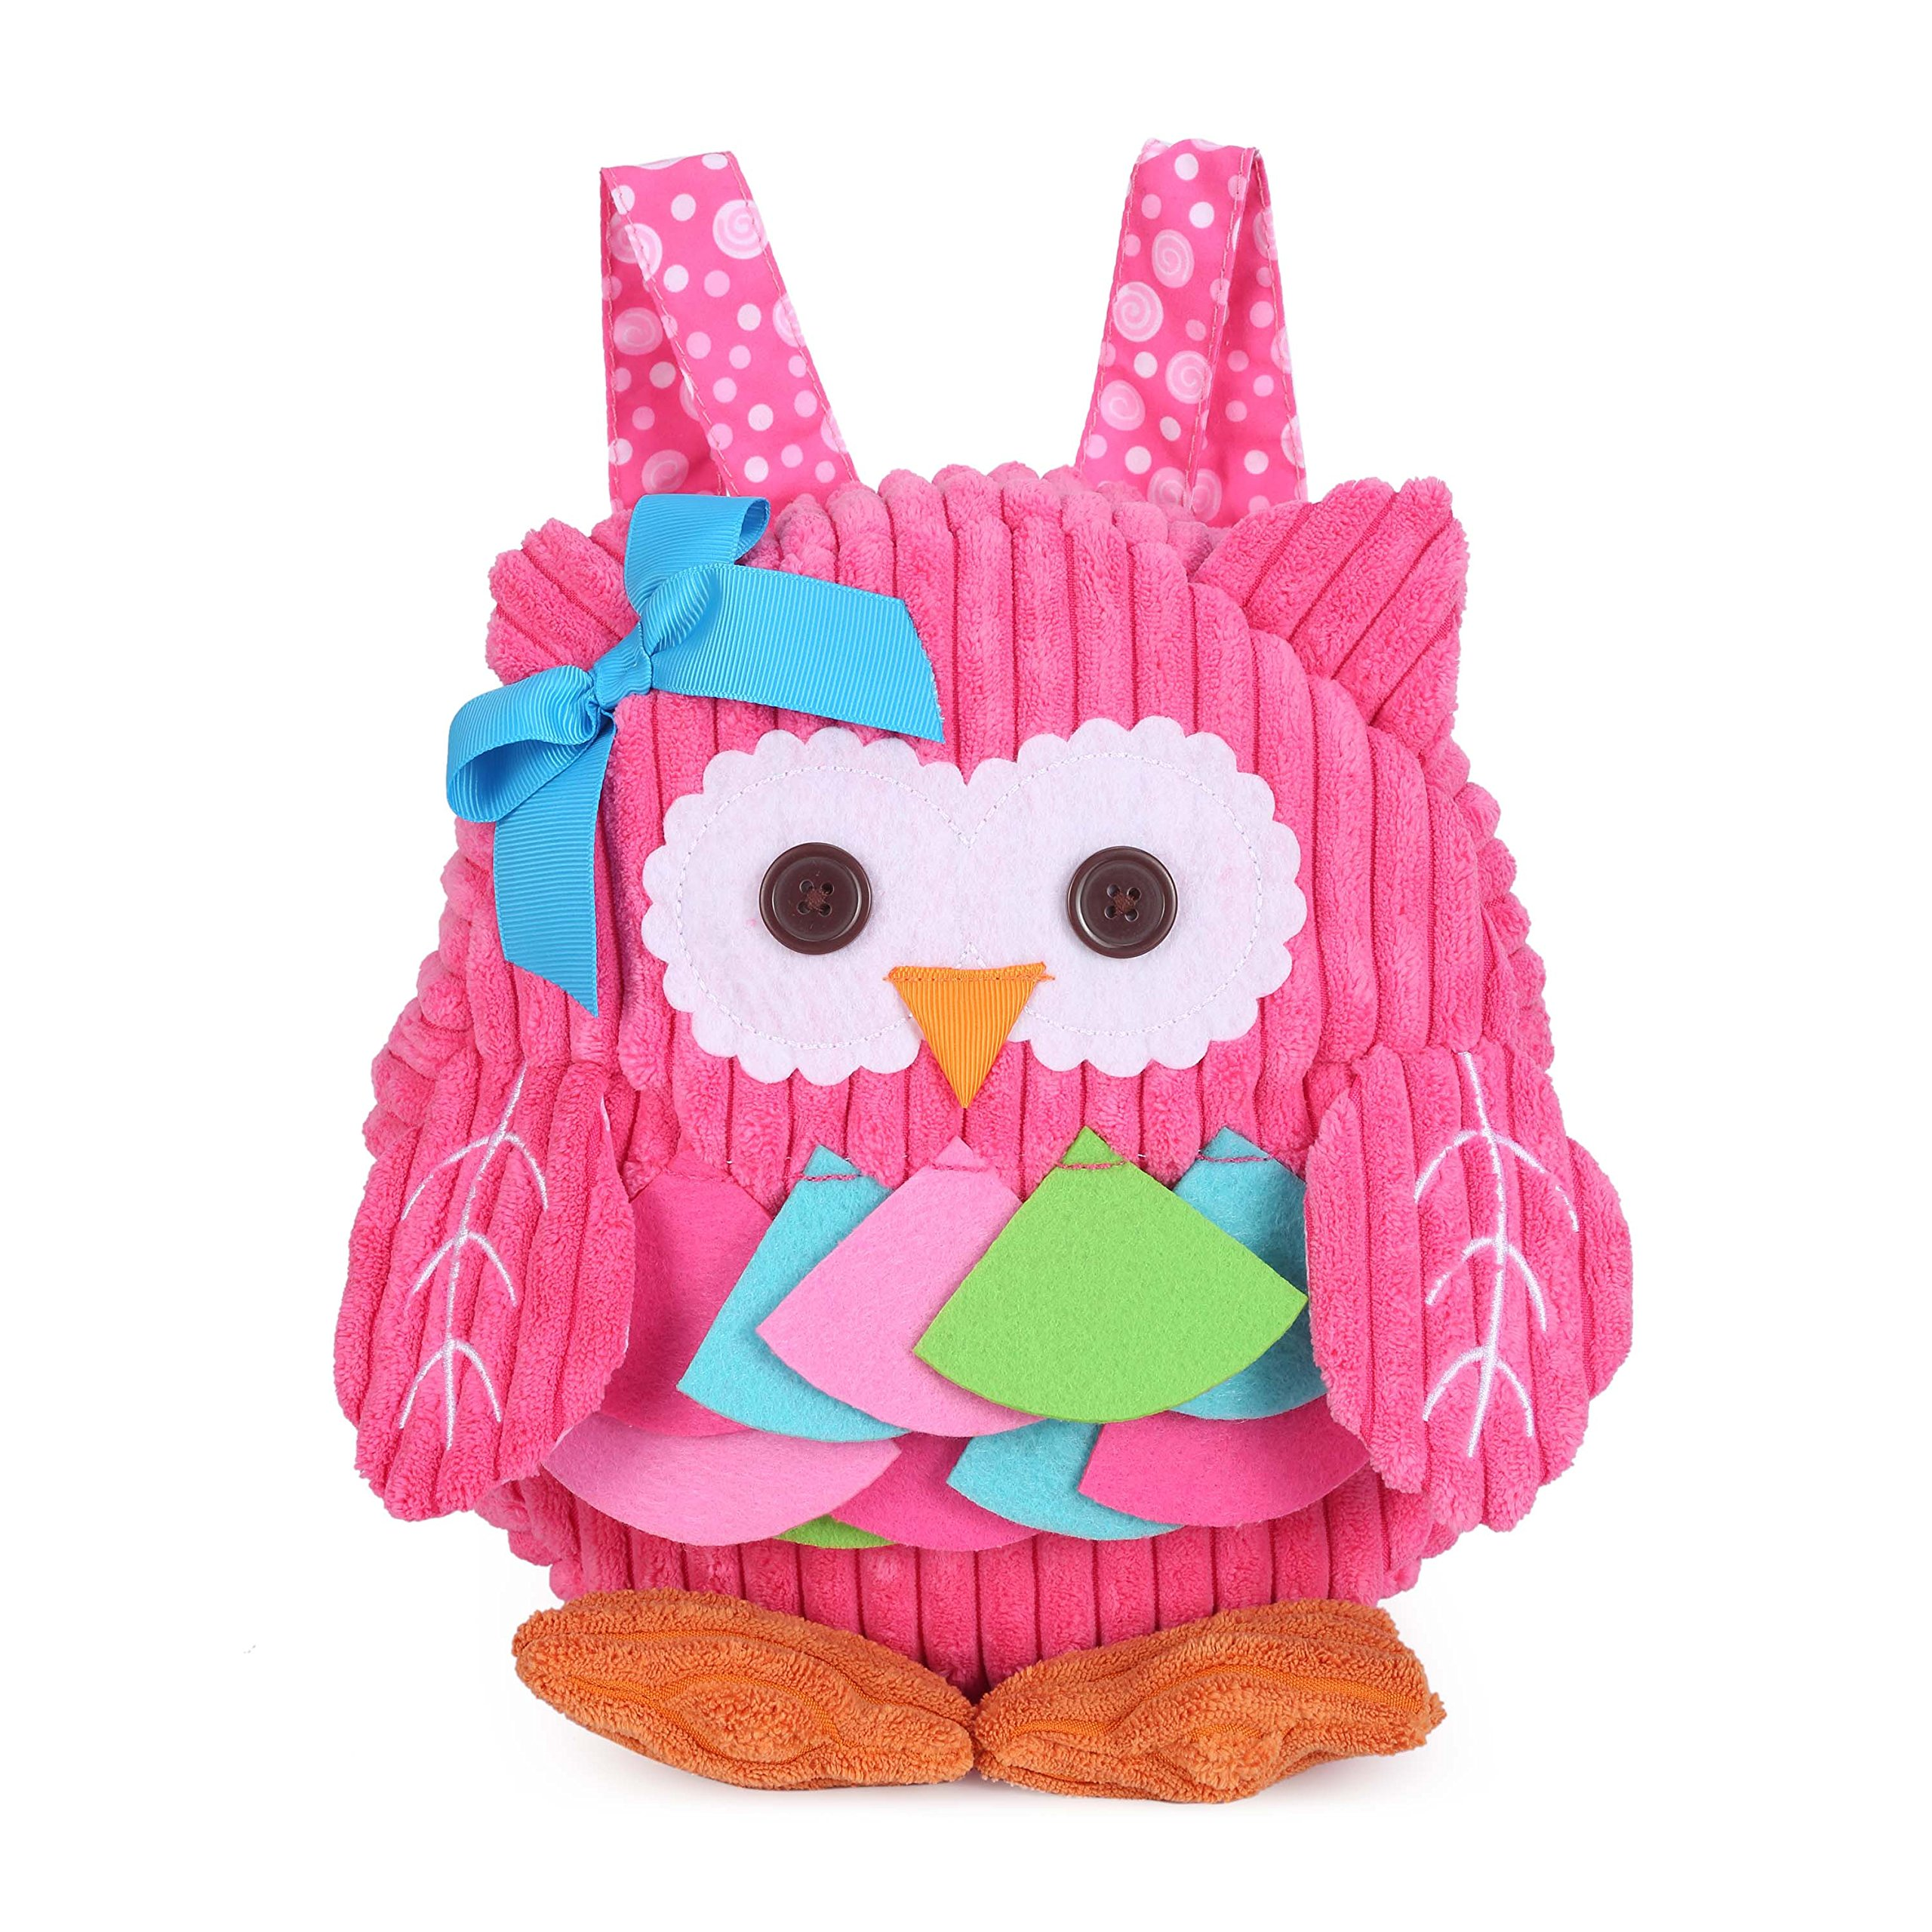 Mini Toddler Backpack for Kids Cute Animal Cartoon Preschool Children Plush Bag